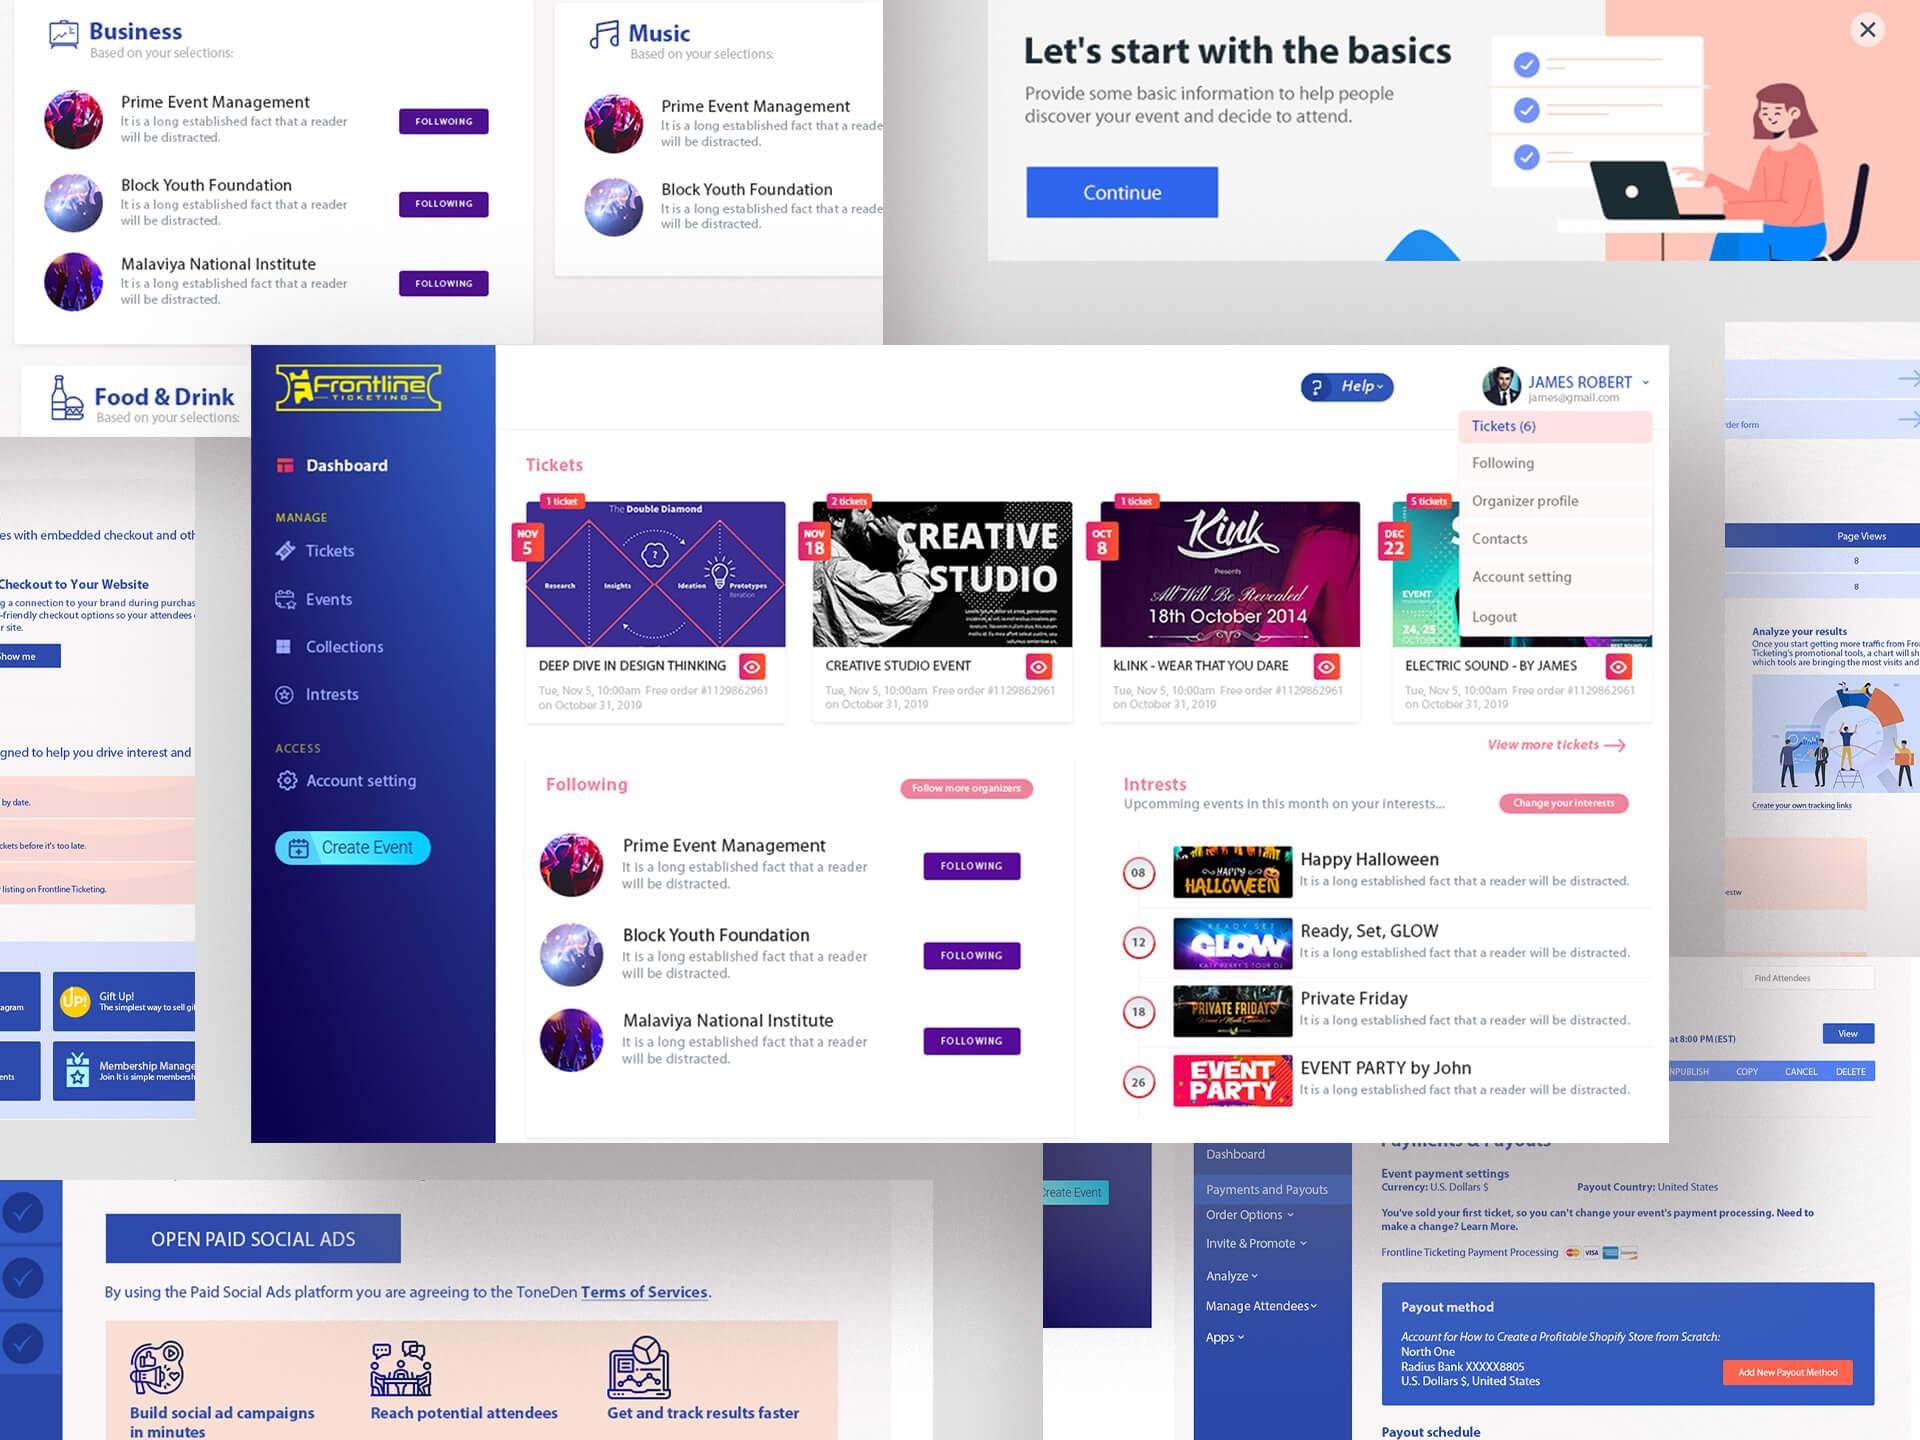 Frontline Ticketing - Web Application Mockup